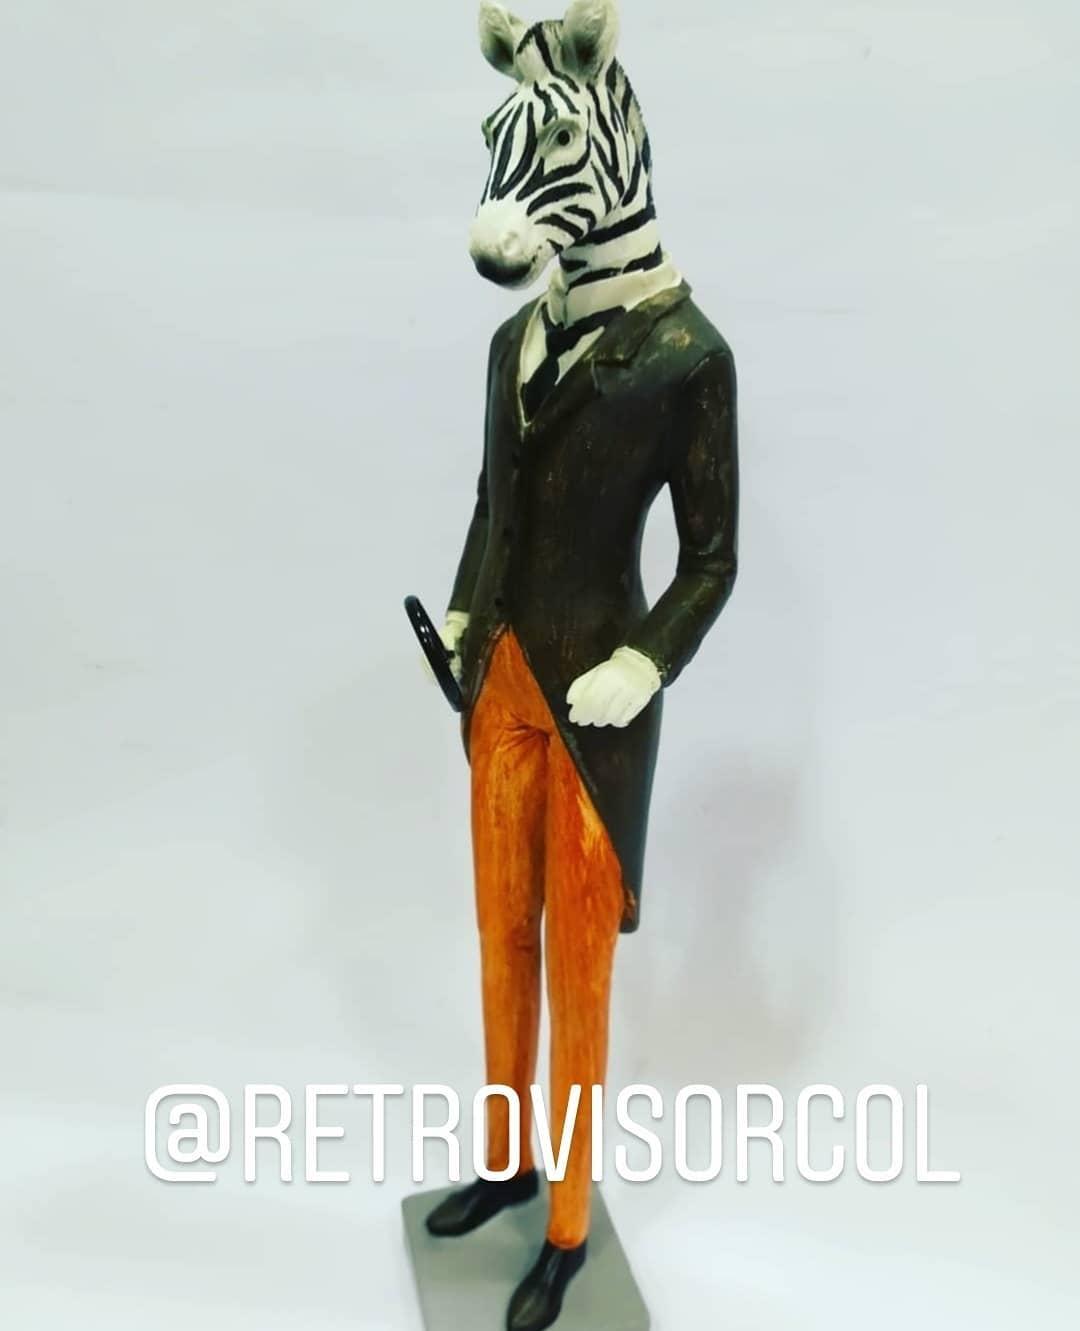 @retrovisorcol #jirafa # zebra #animal # decoração #retro #retrovisor #hojalata # ...